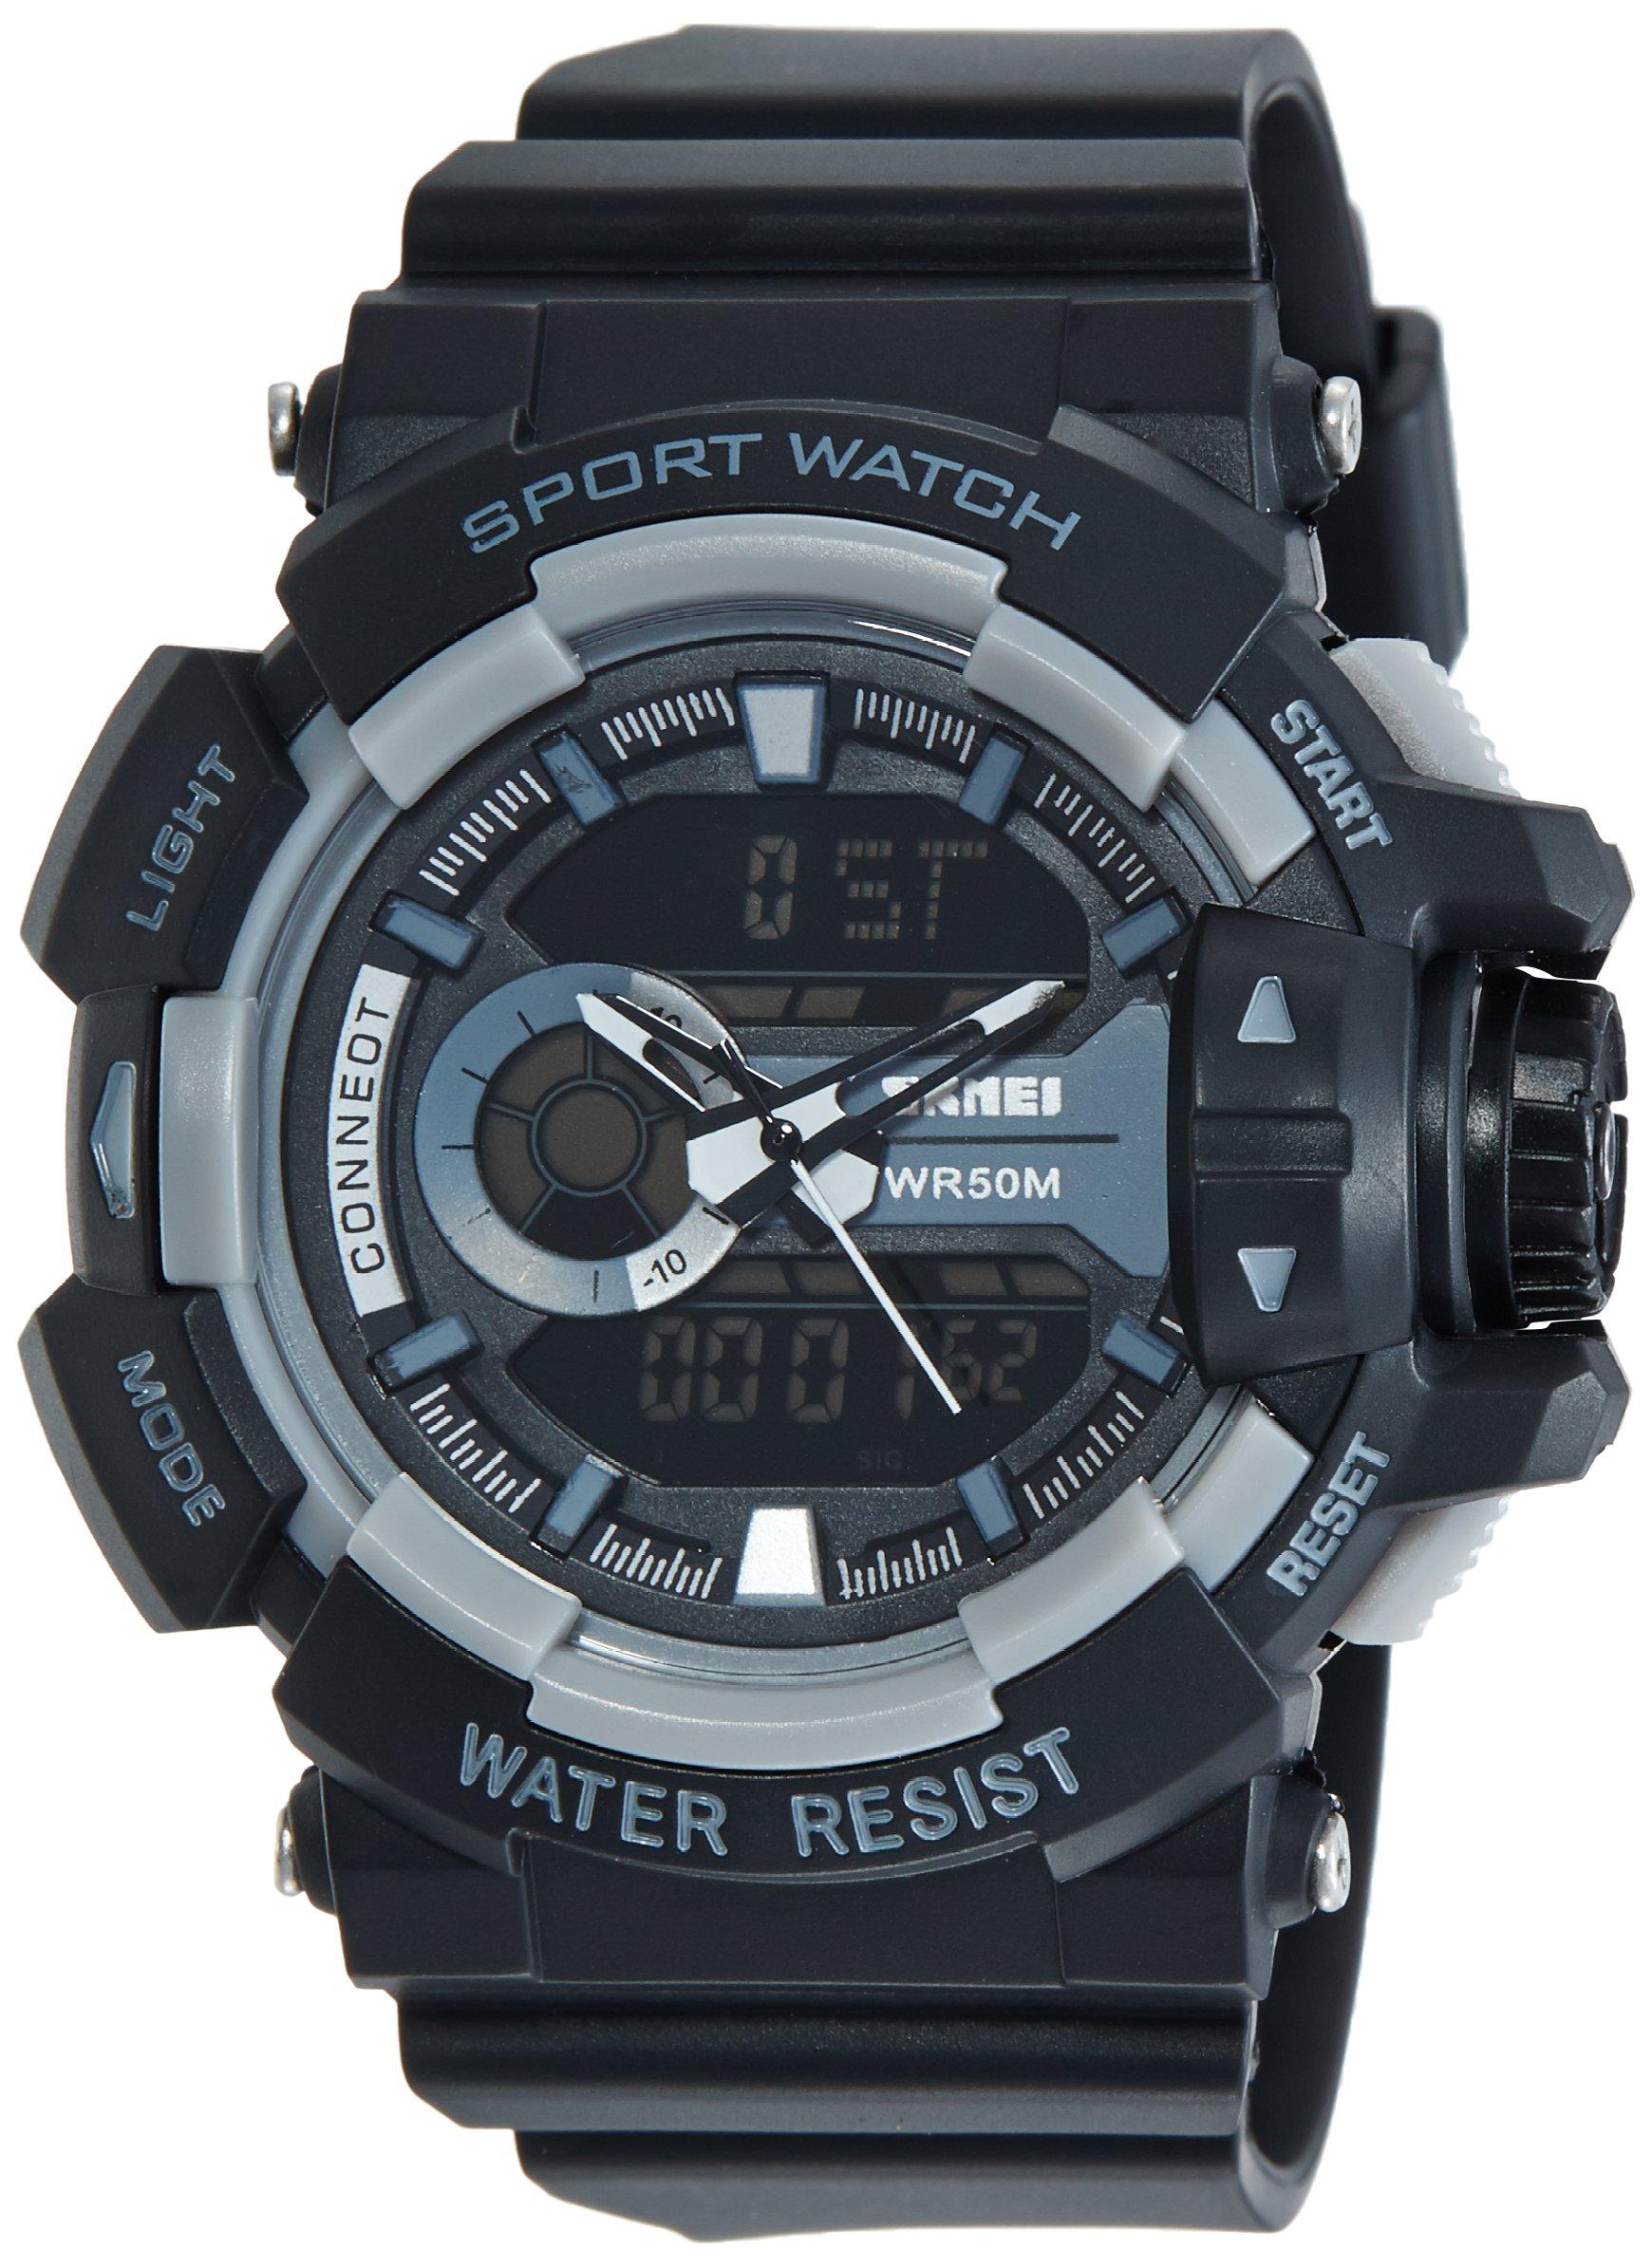 Smael Analogue Digital Dual Quartz Movement Military Design Water Resistant Sports Men's Watch -1509 product image